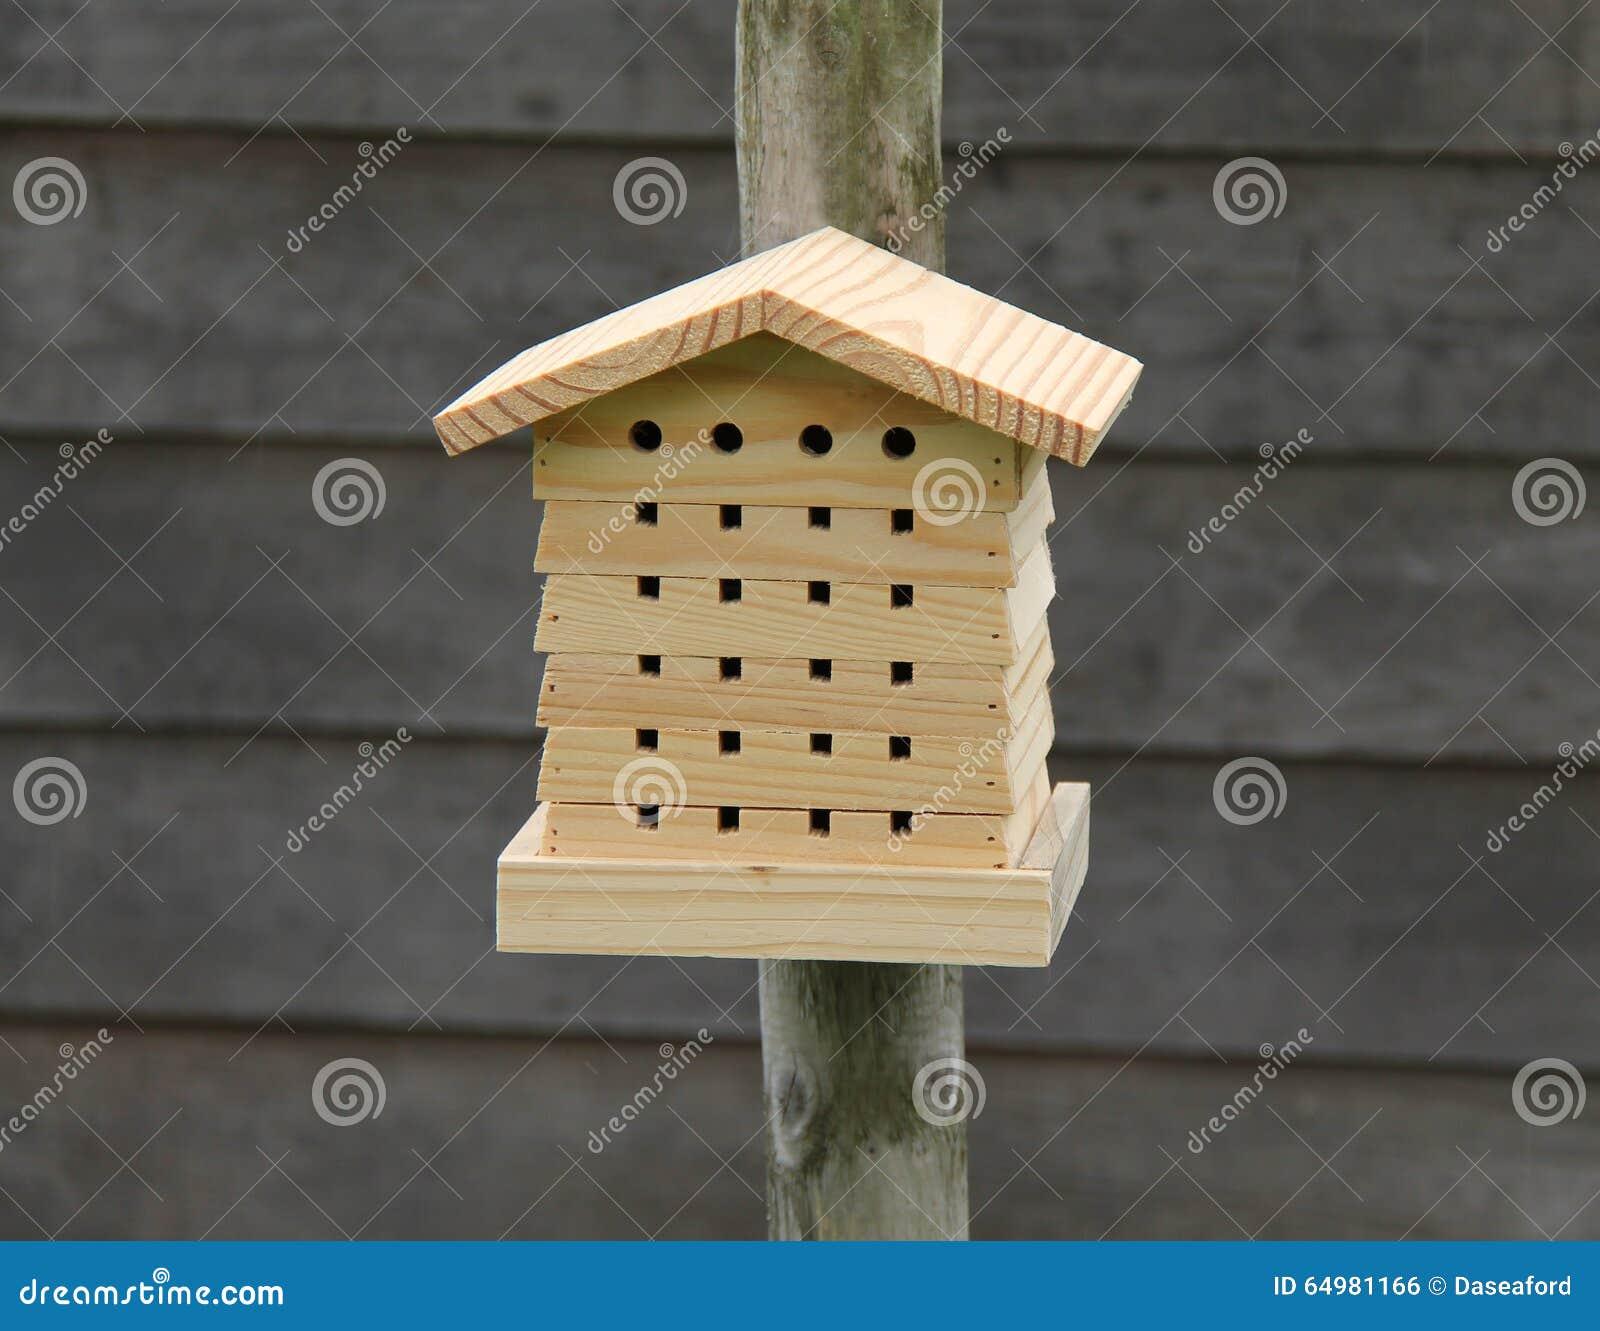 insekten haus stockfoto bild 64981166. Black Bedroom Furniture Sets. Home Design Ideas